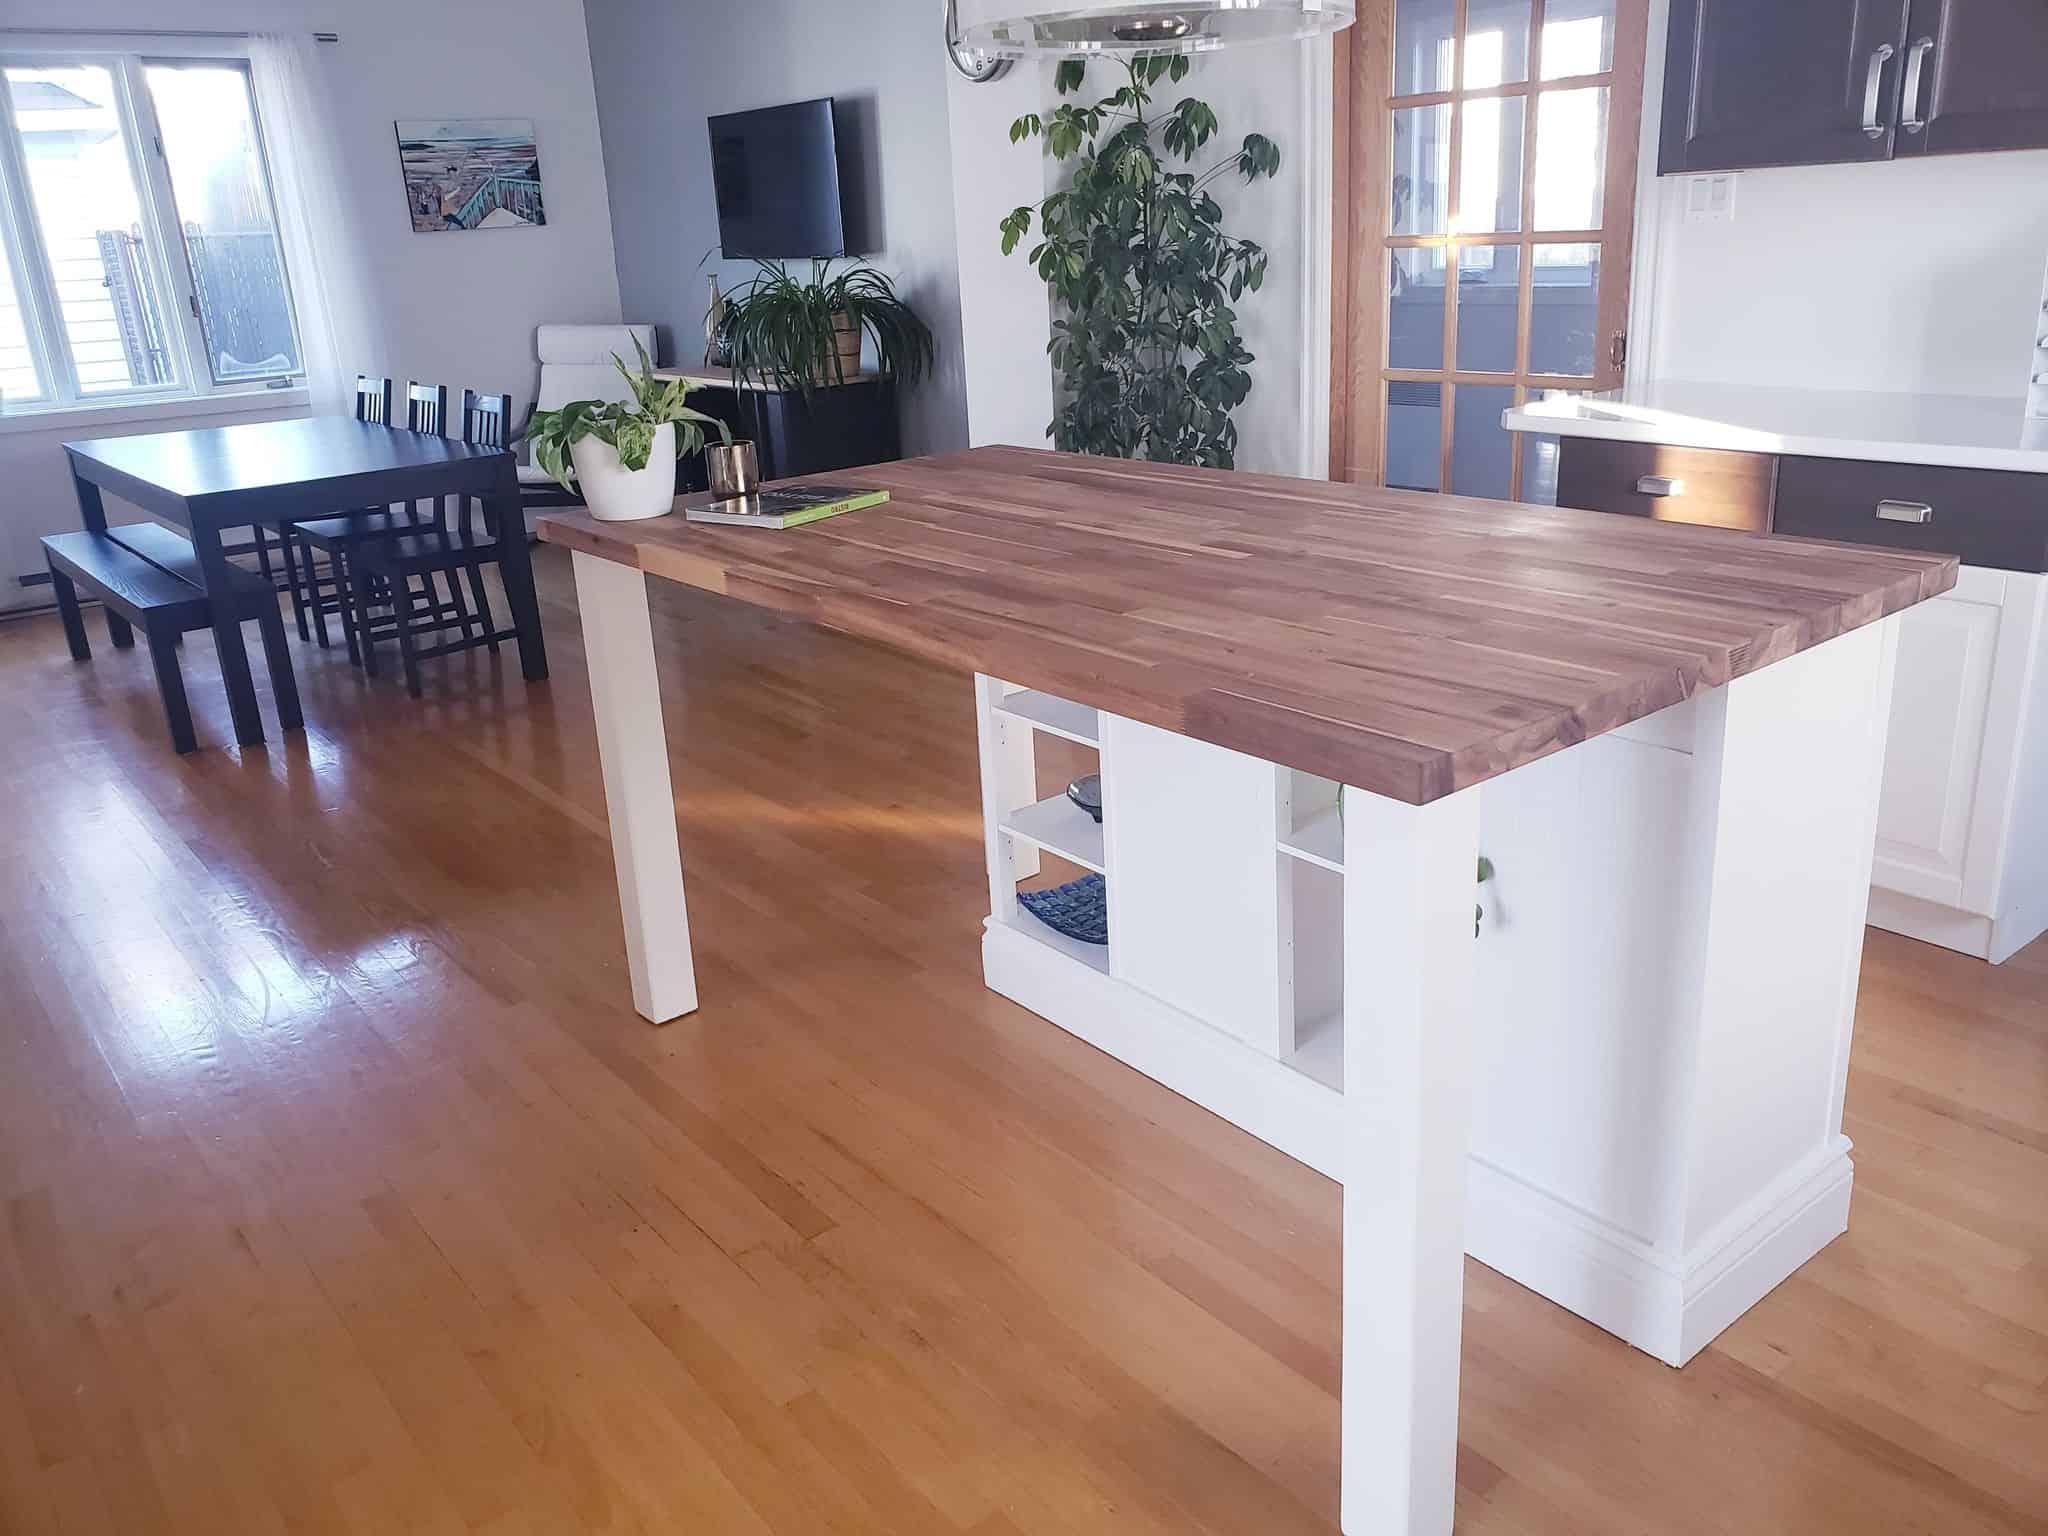 Creating a kitchen island